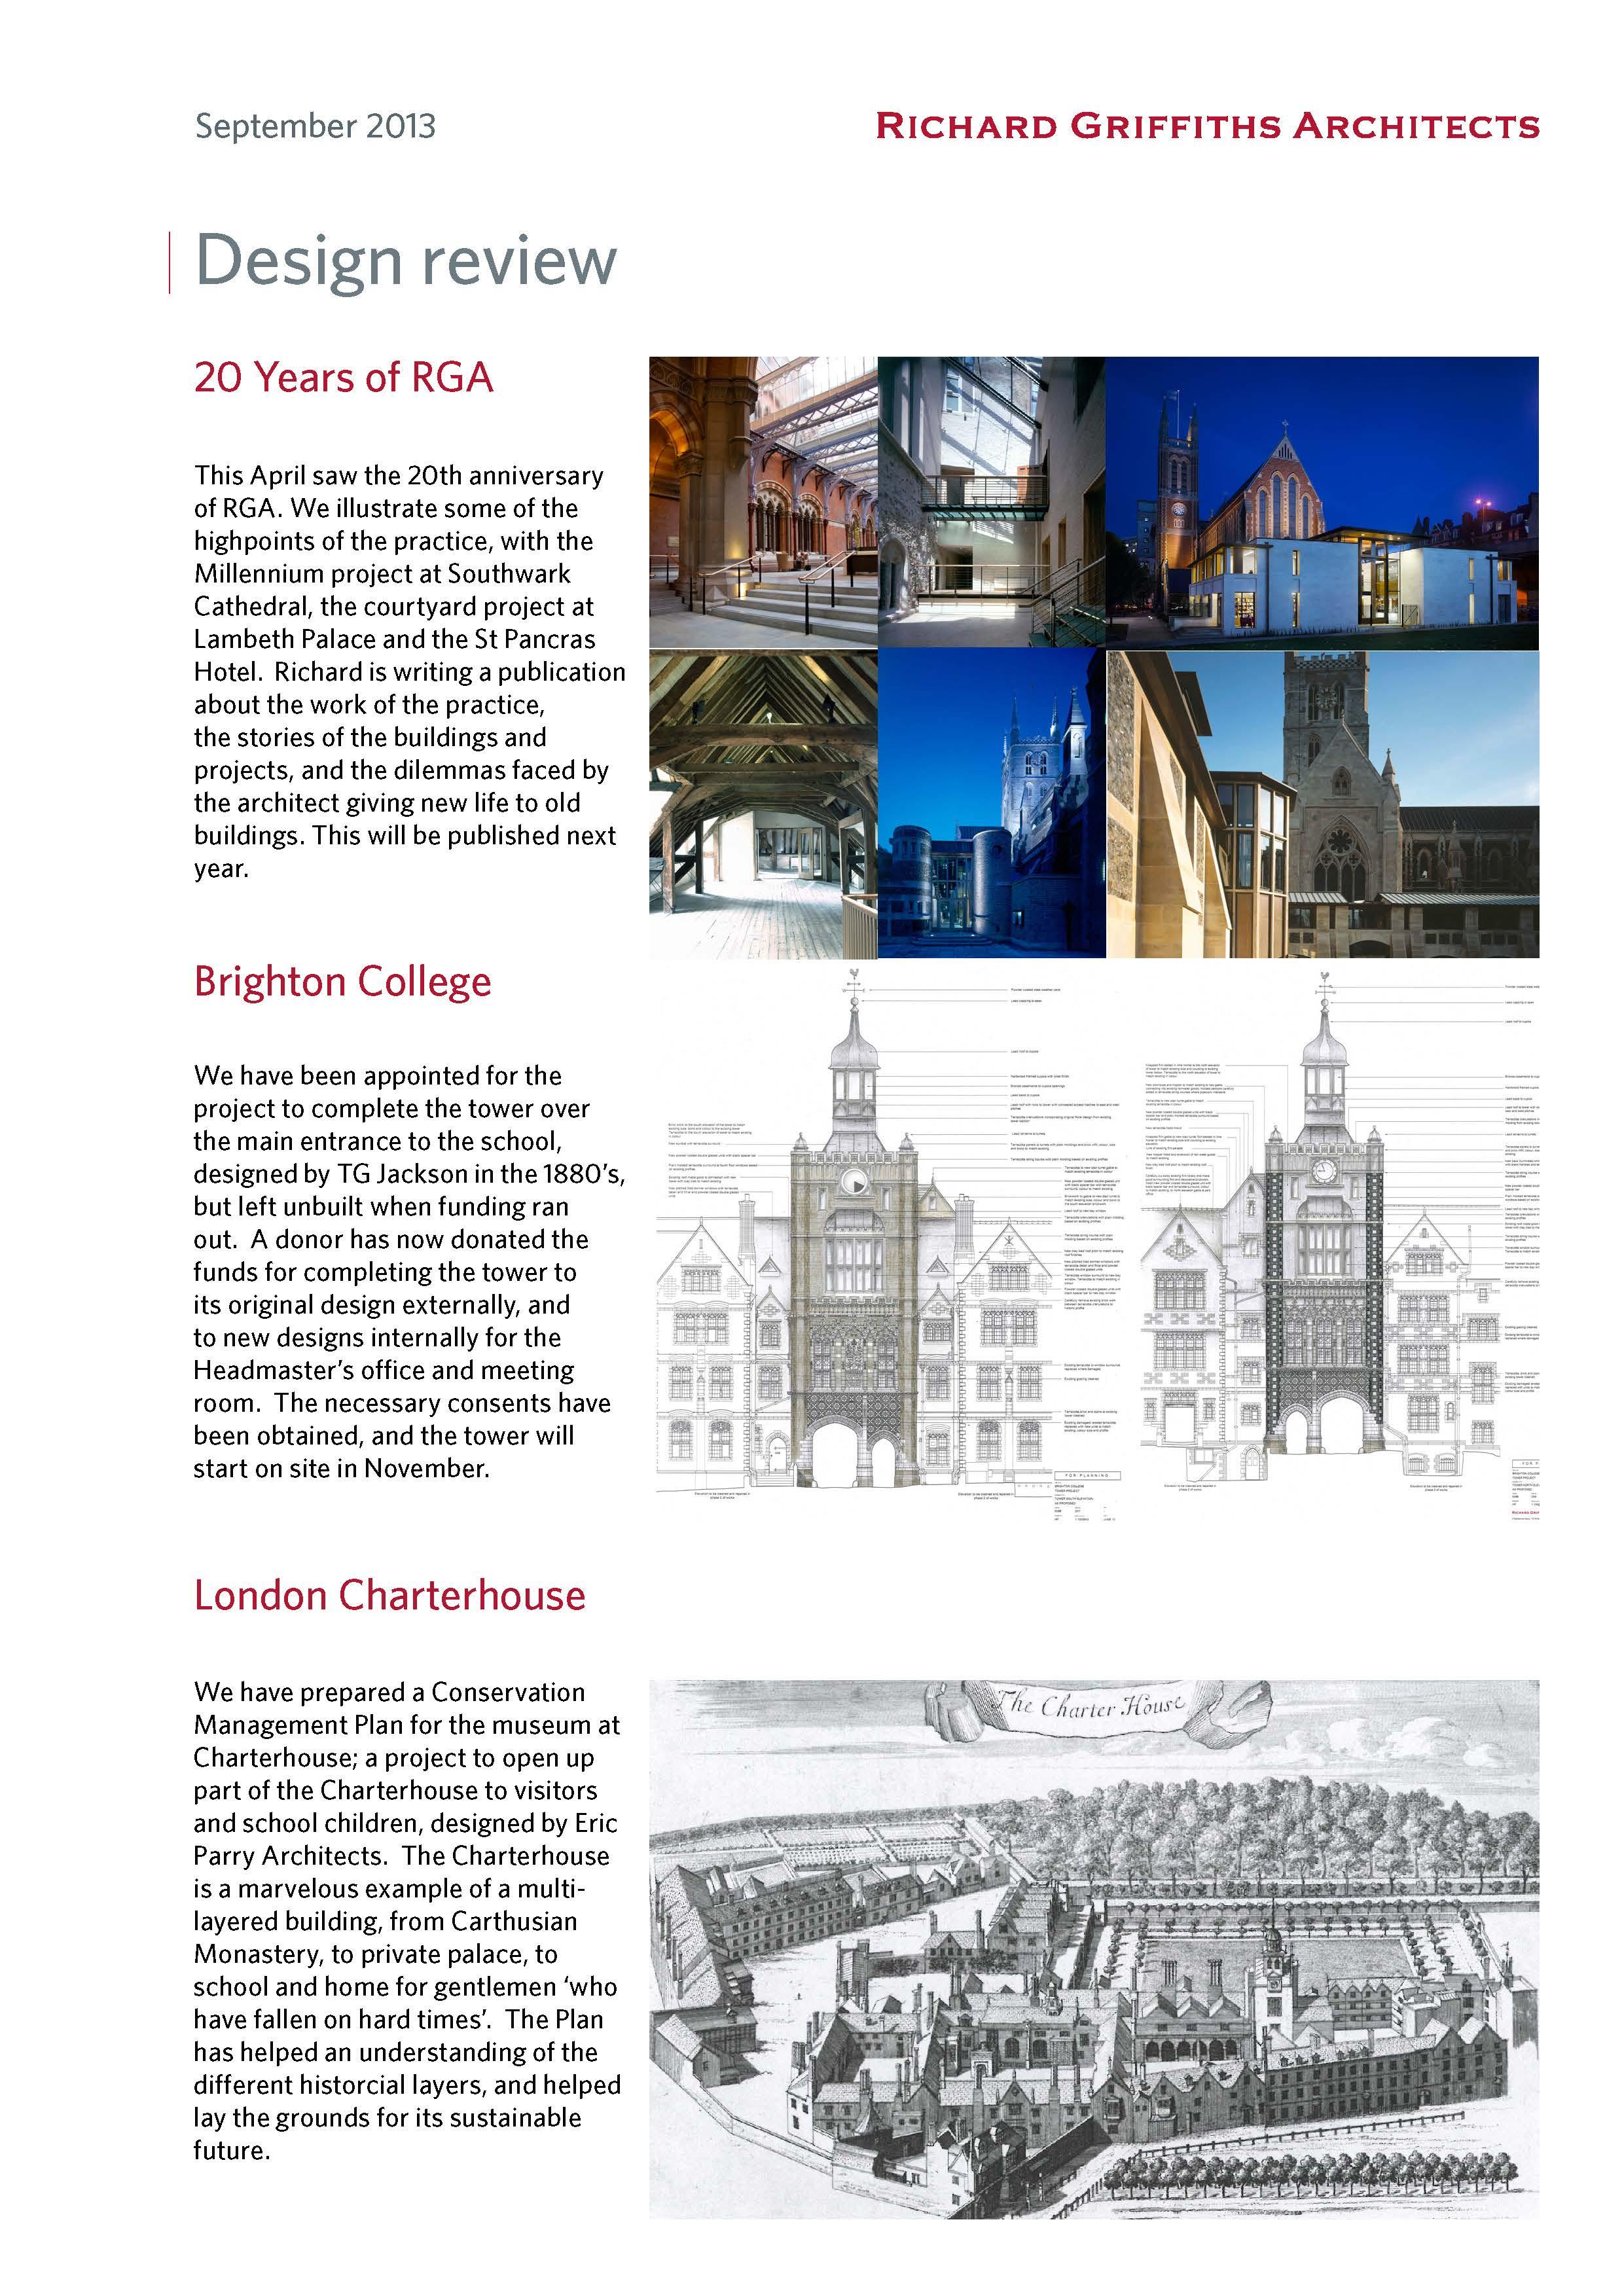 Design Review, September 2013